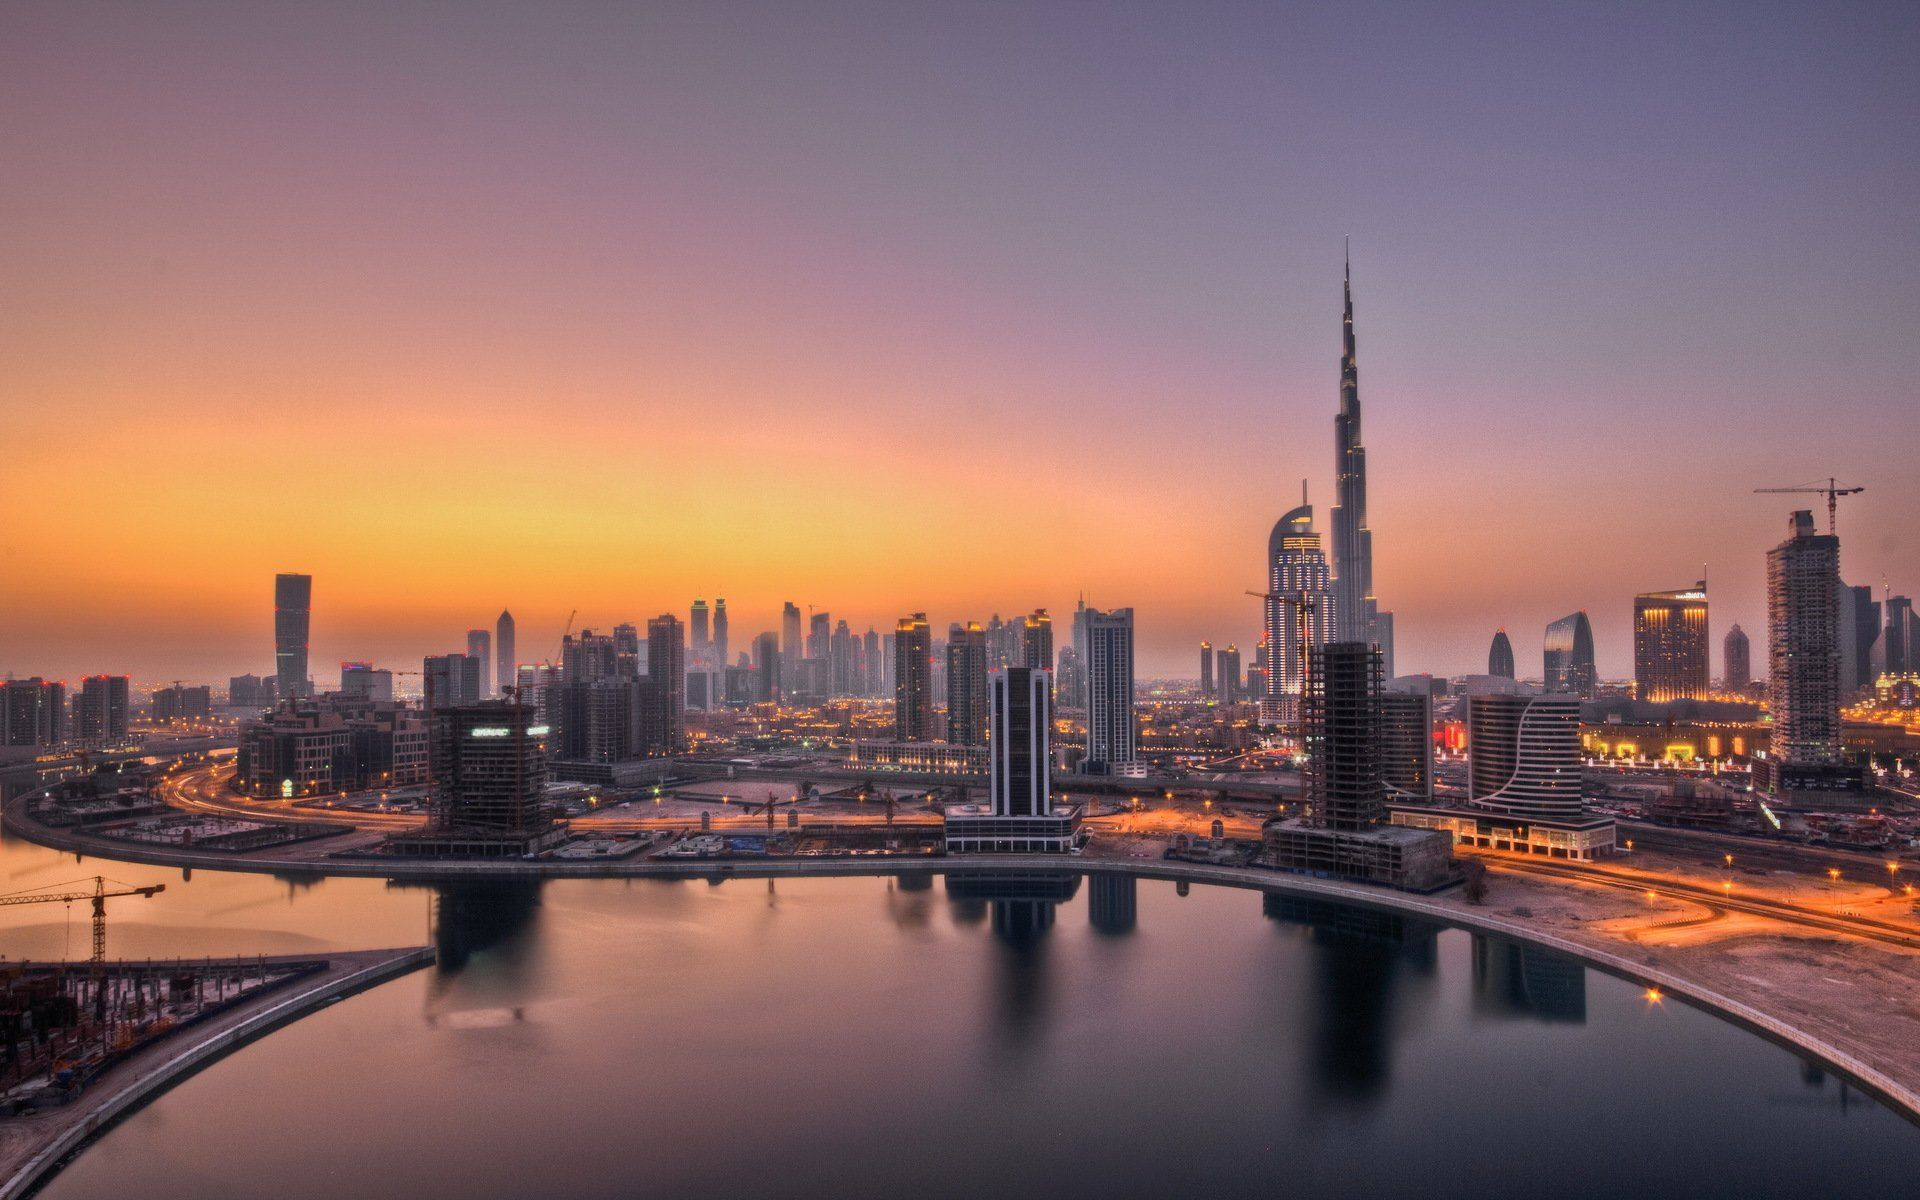 Types of Business Setup in Dubai